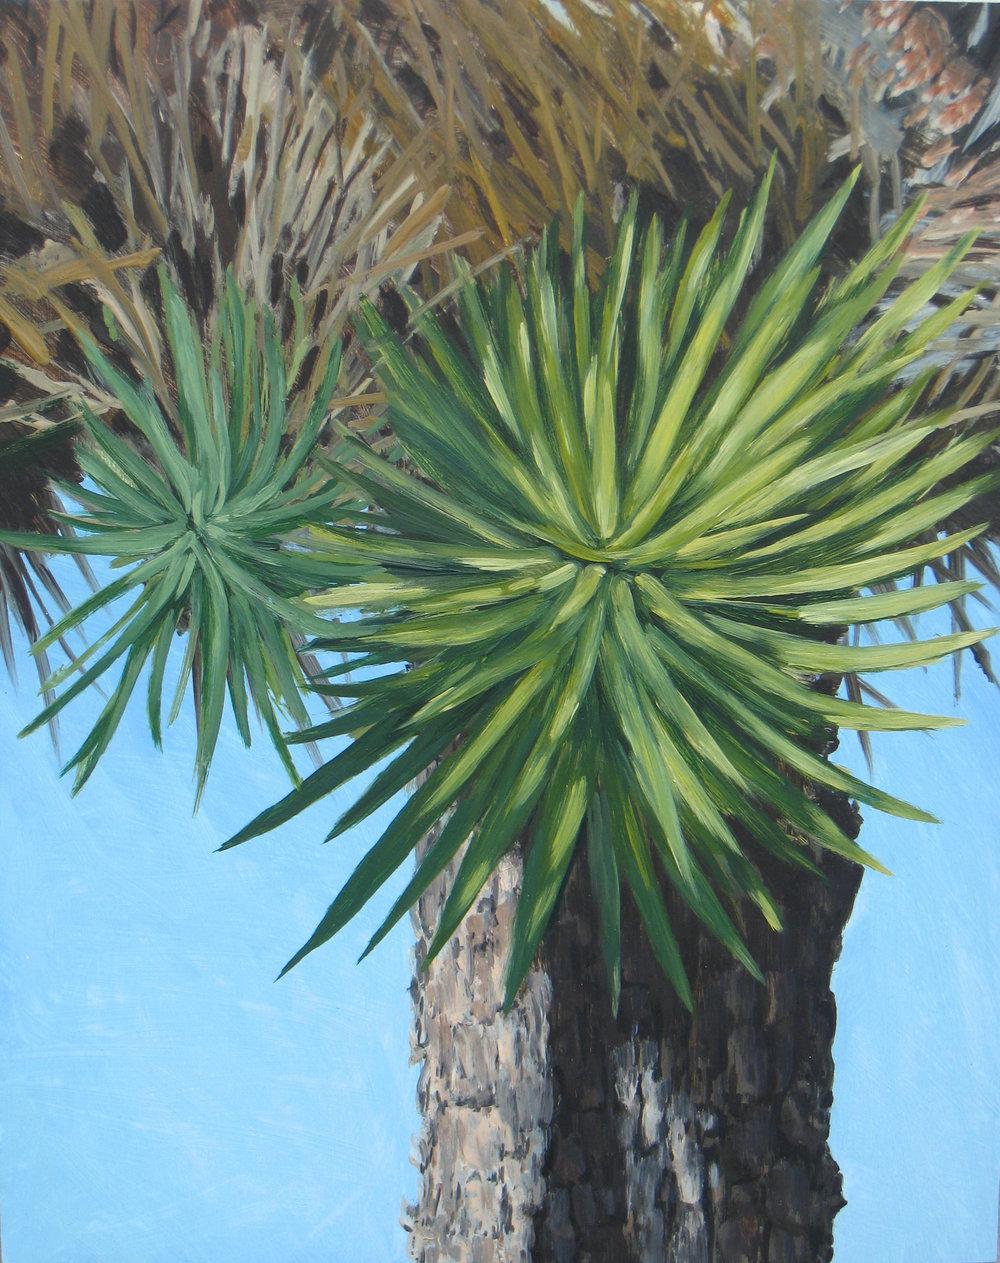 Joshua Tree 4, 2008